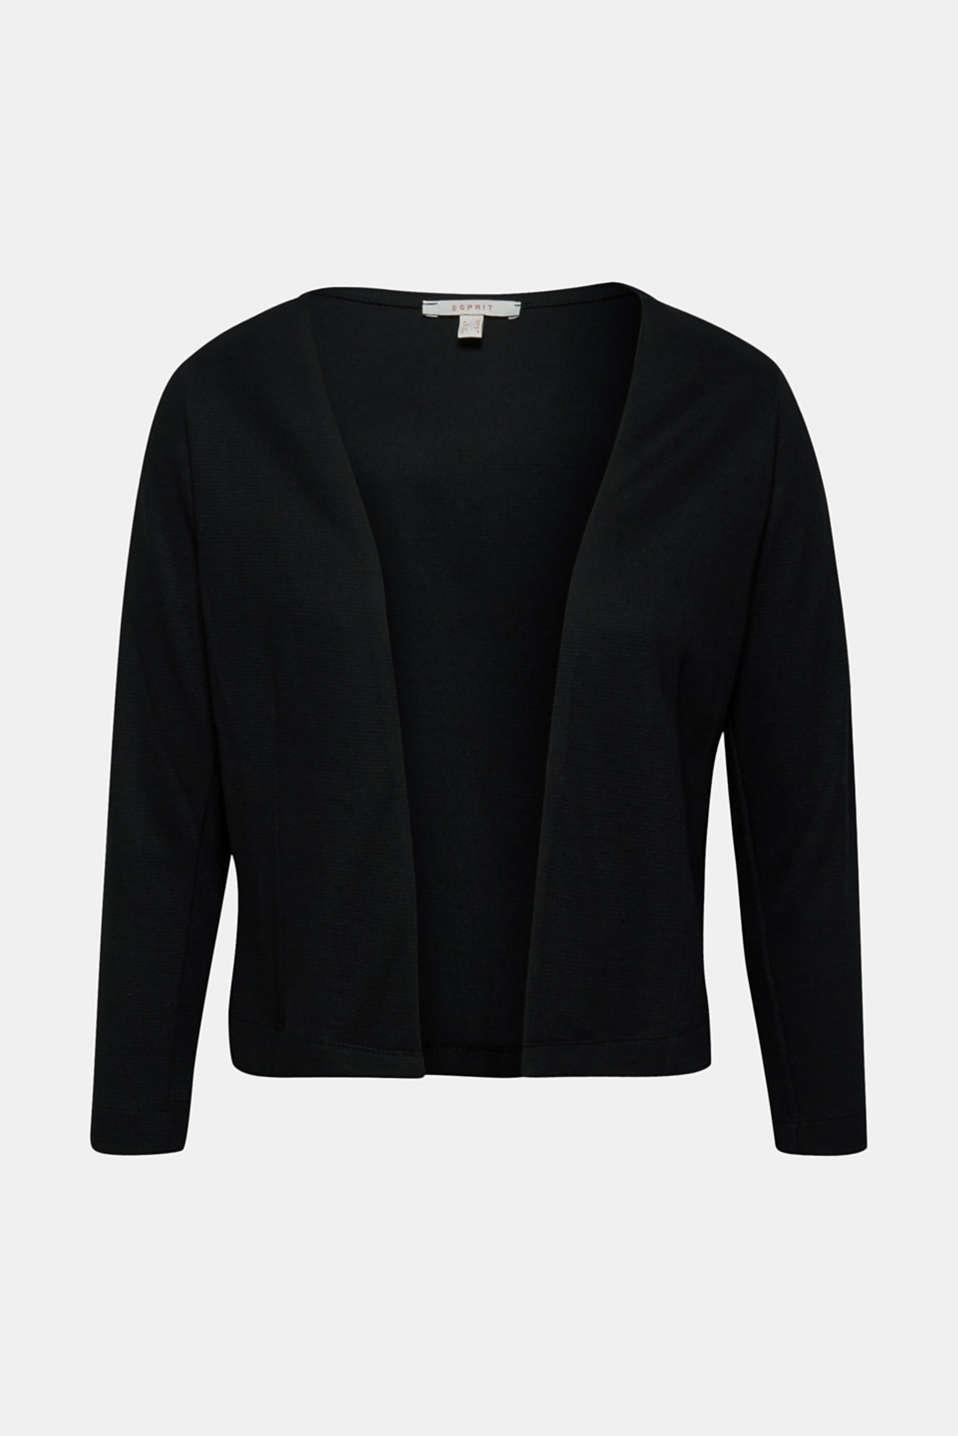 Jackets indoor knitted, BLACK, detail image number 9